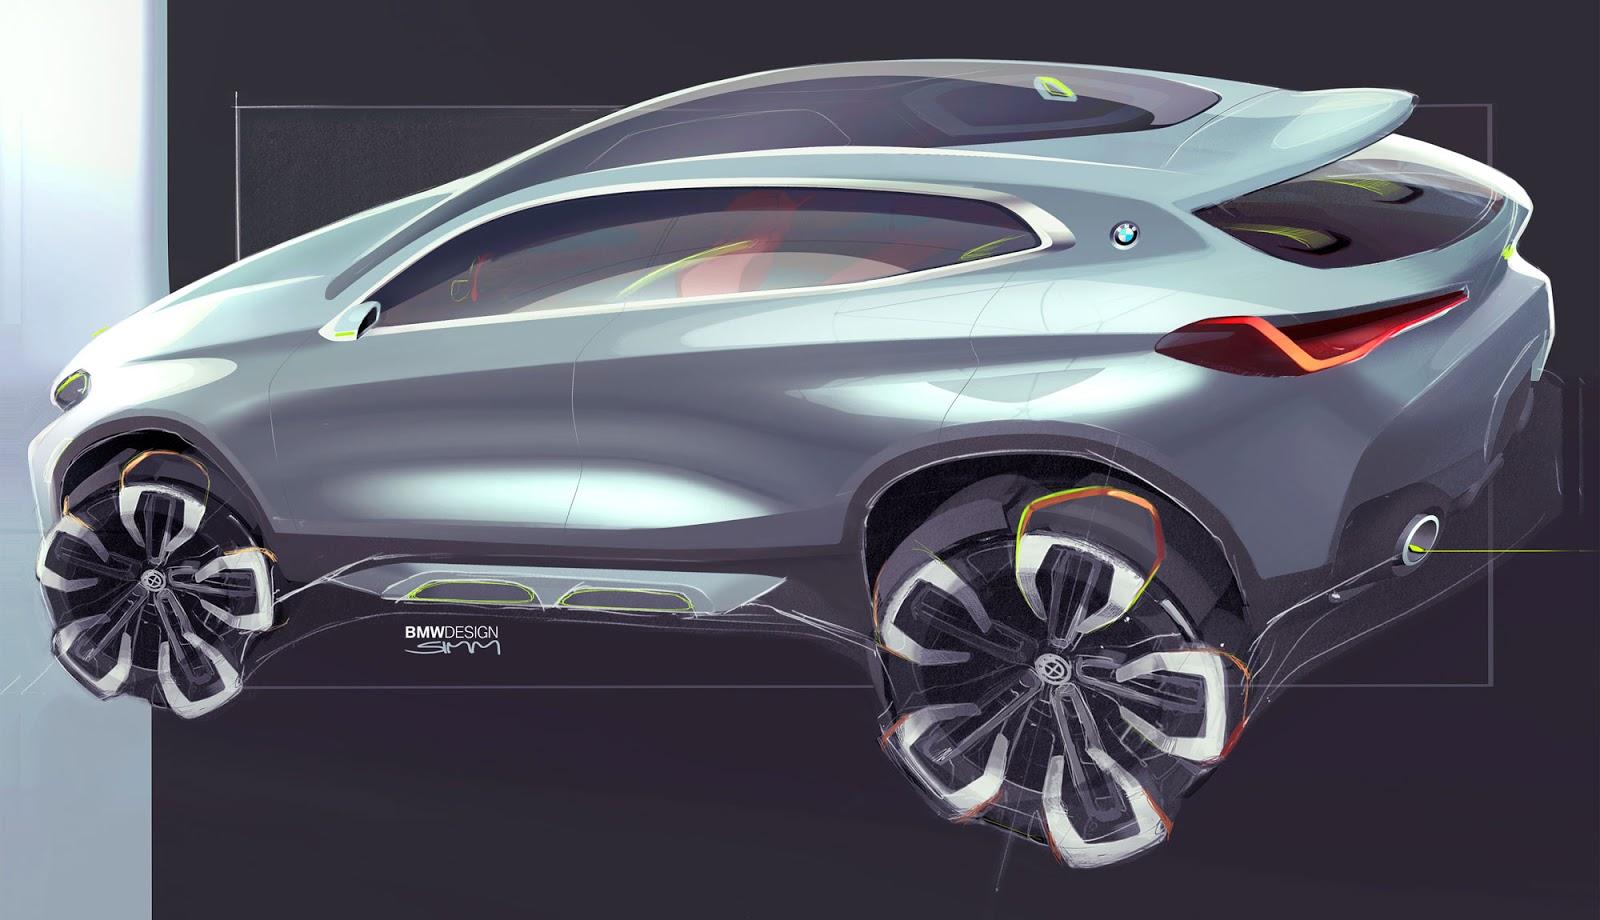 BMW X2 sketch by Sebastian Simm - side view in silver